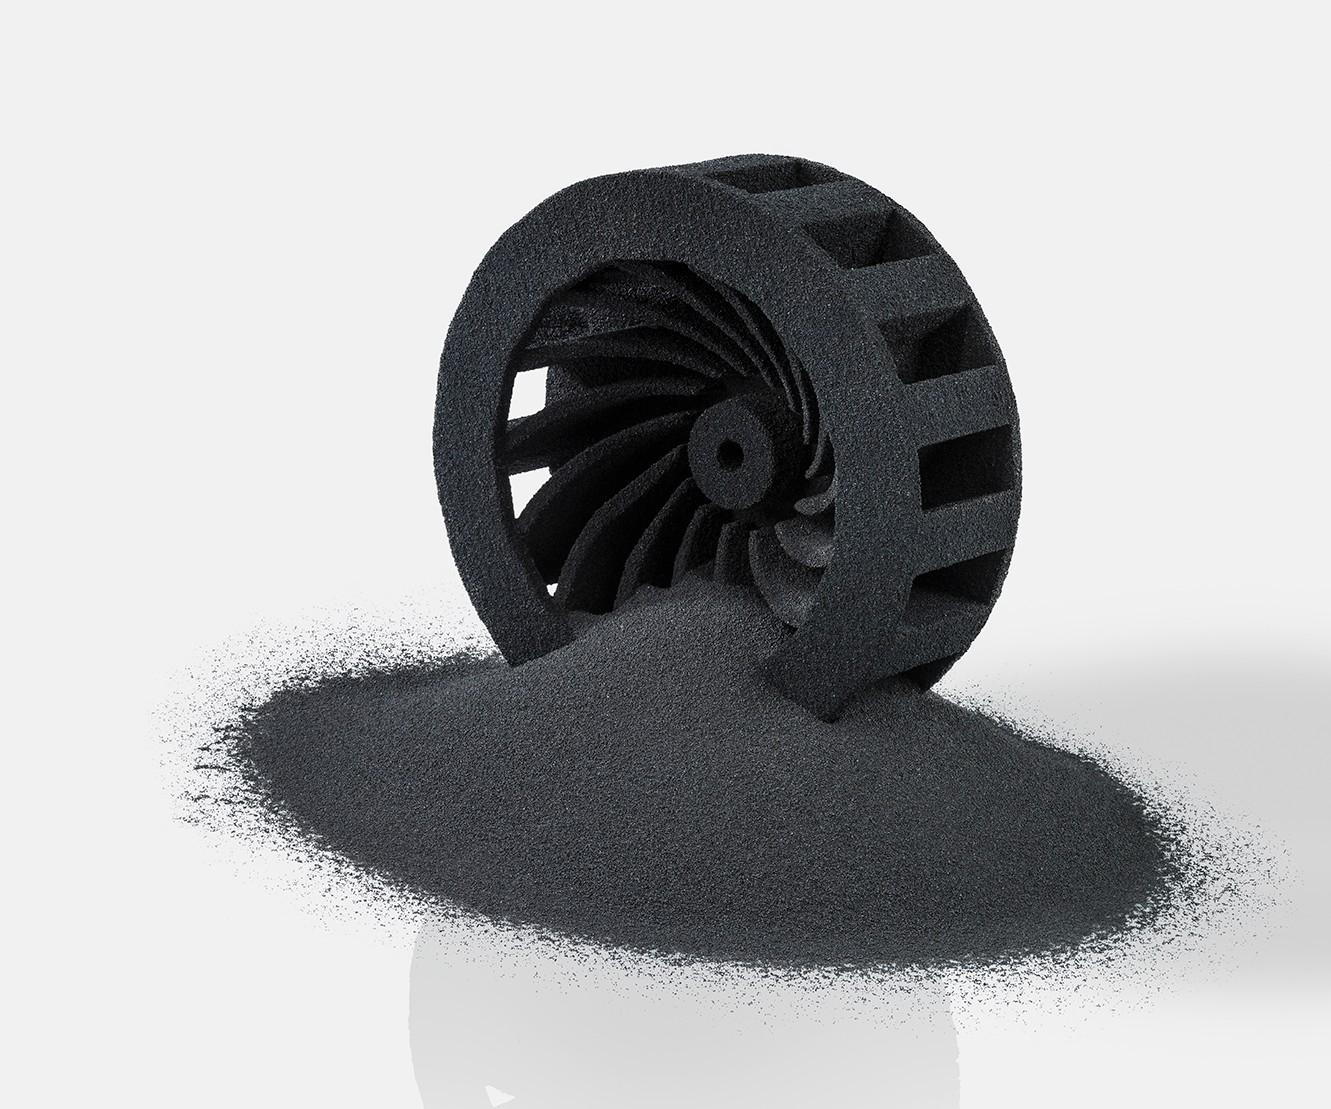 3D printed carbon fiber rotor